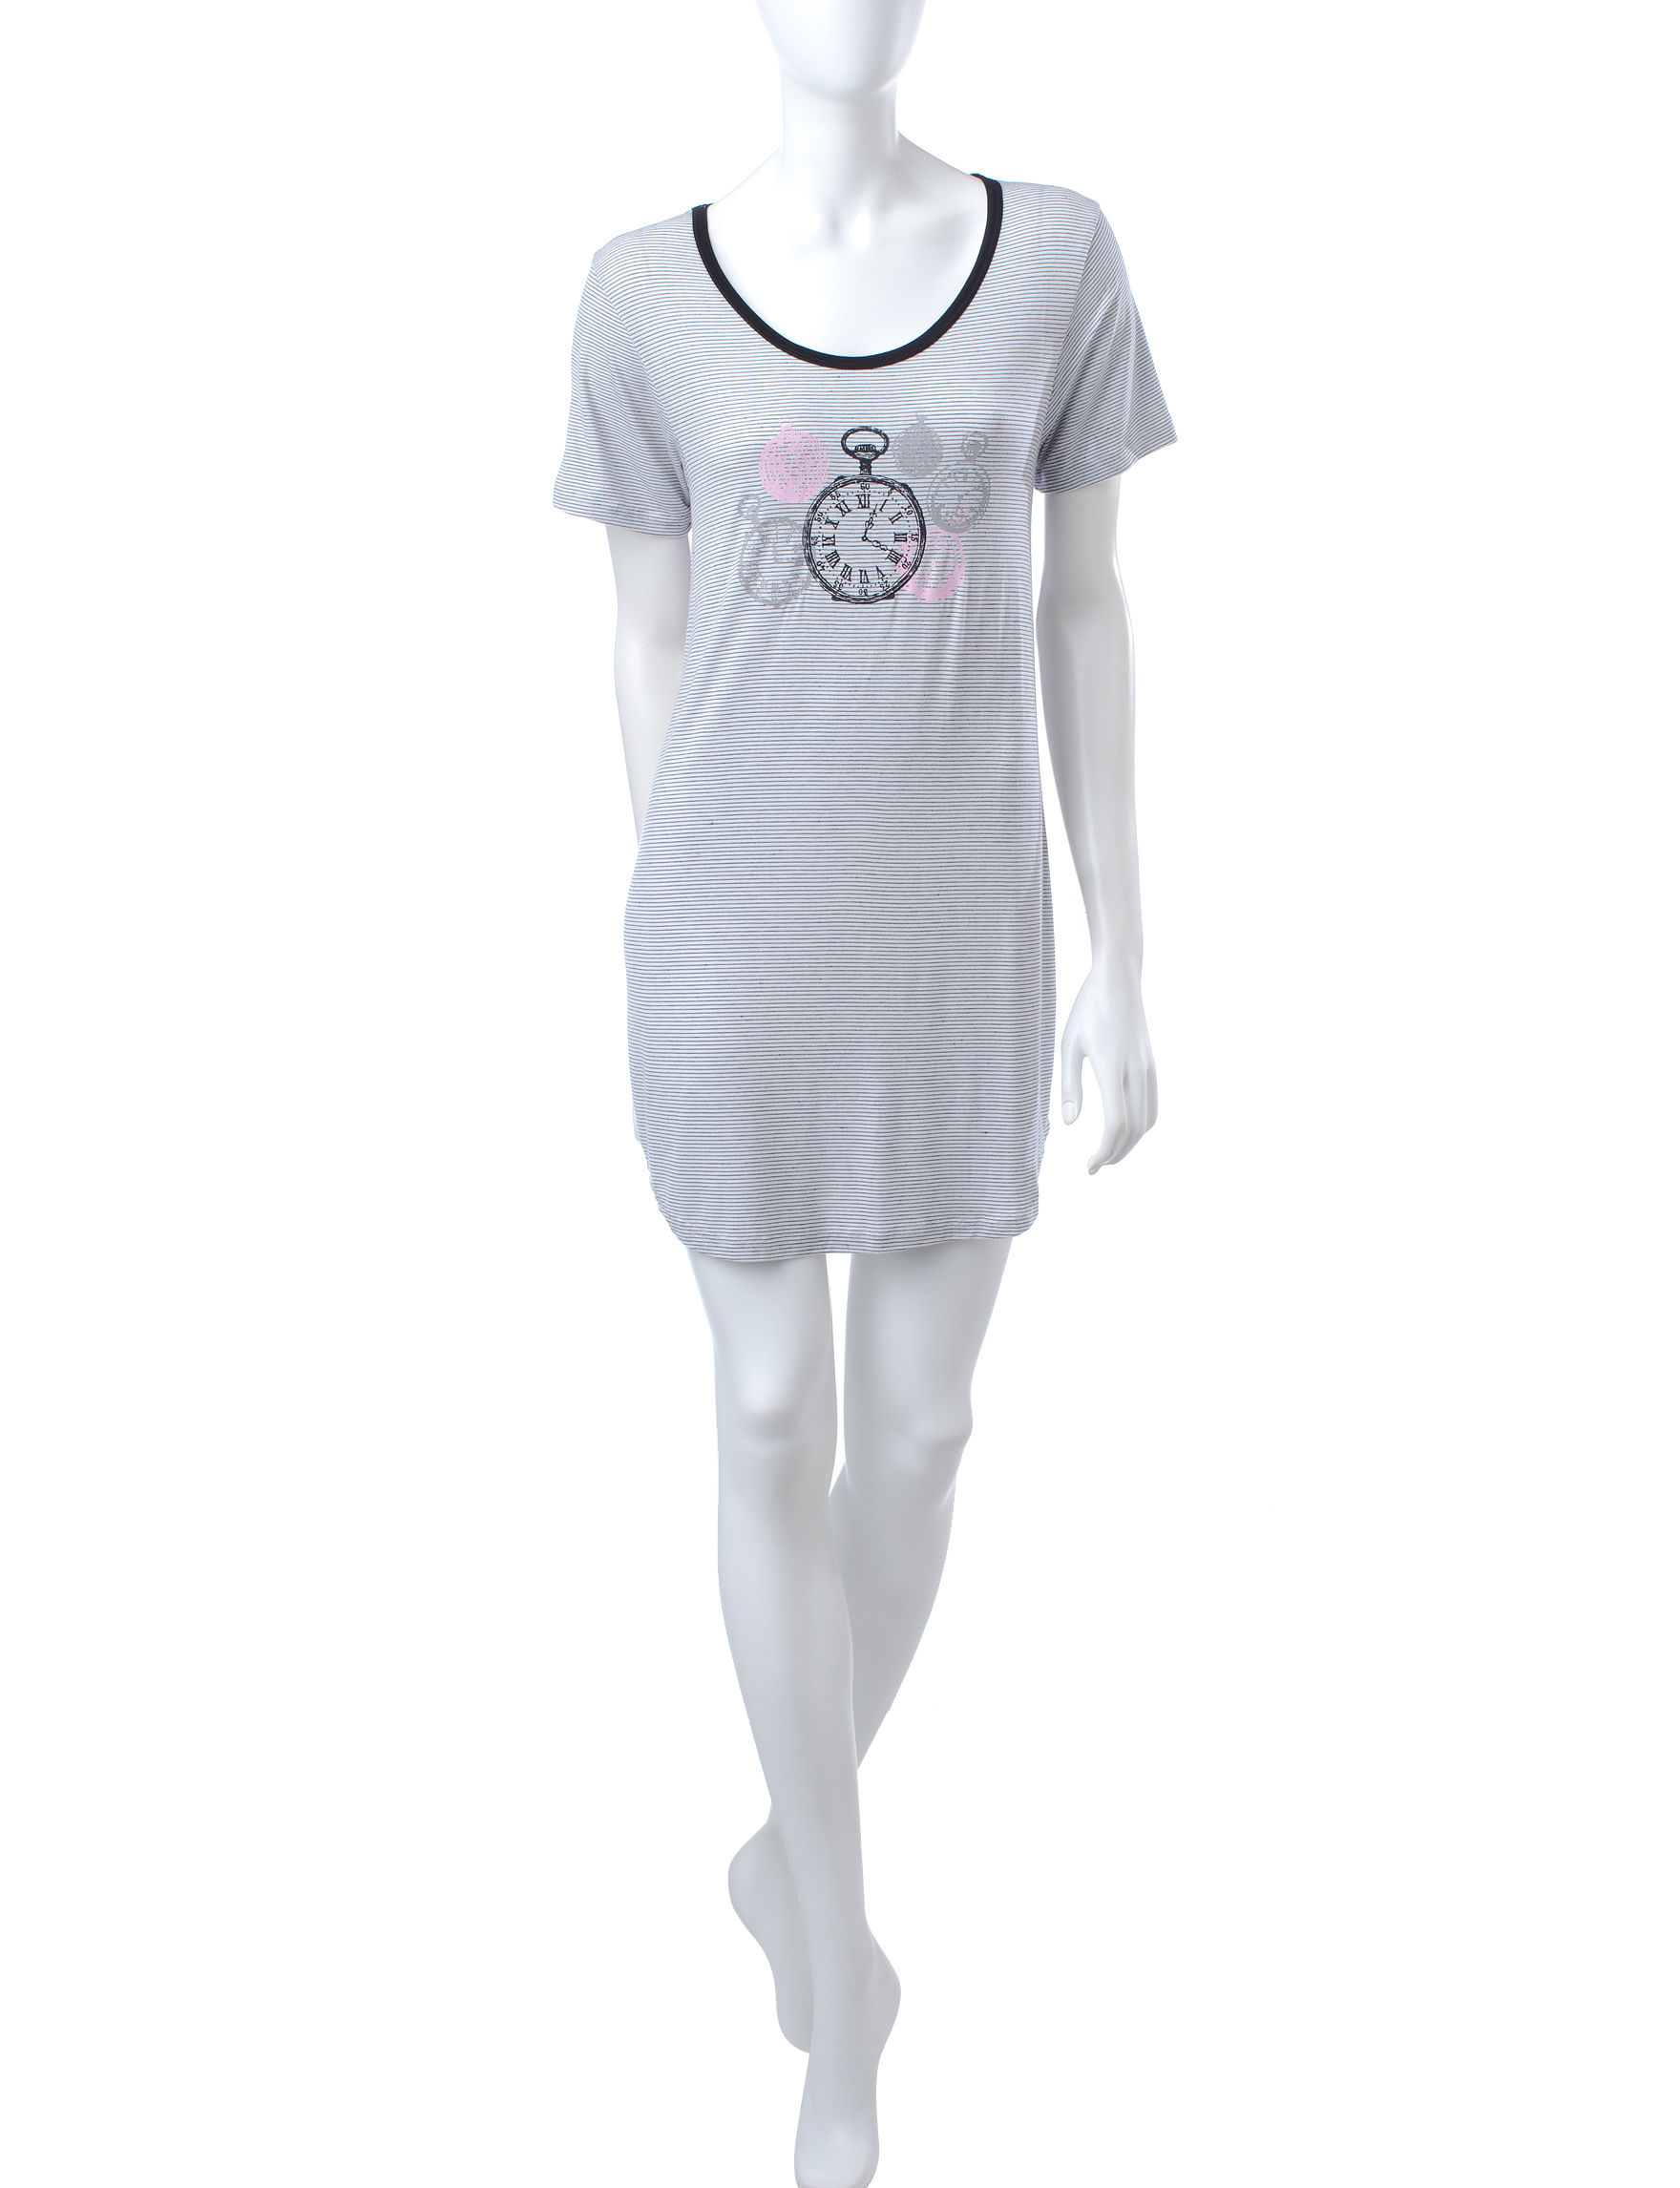 Laura Ashley Black / White Nightgowns & Sleep Shirts